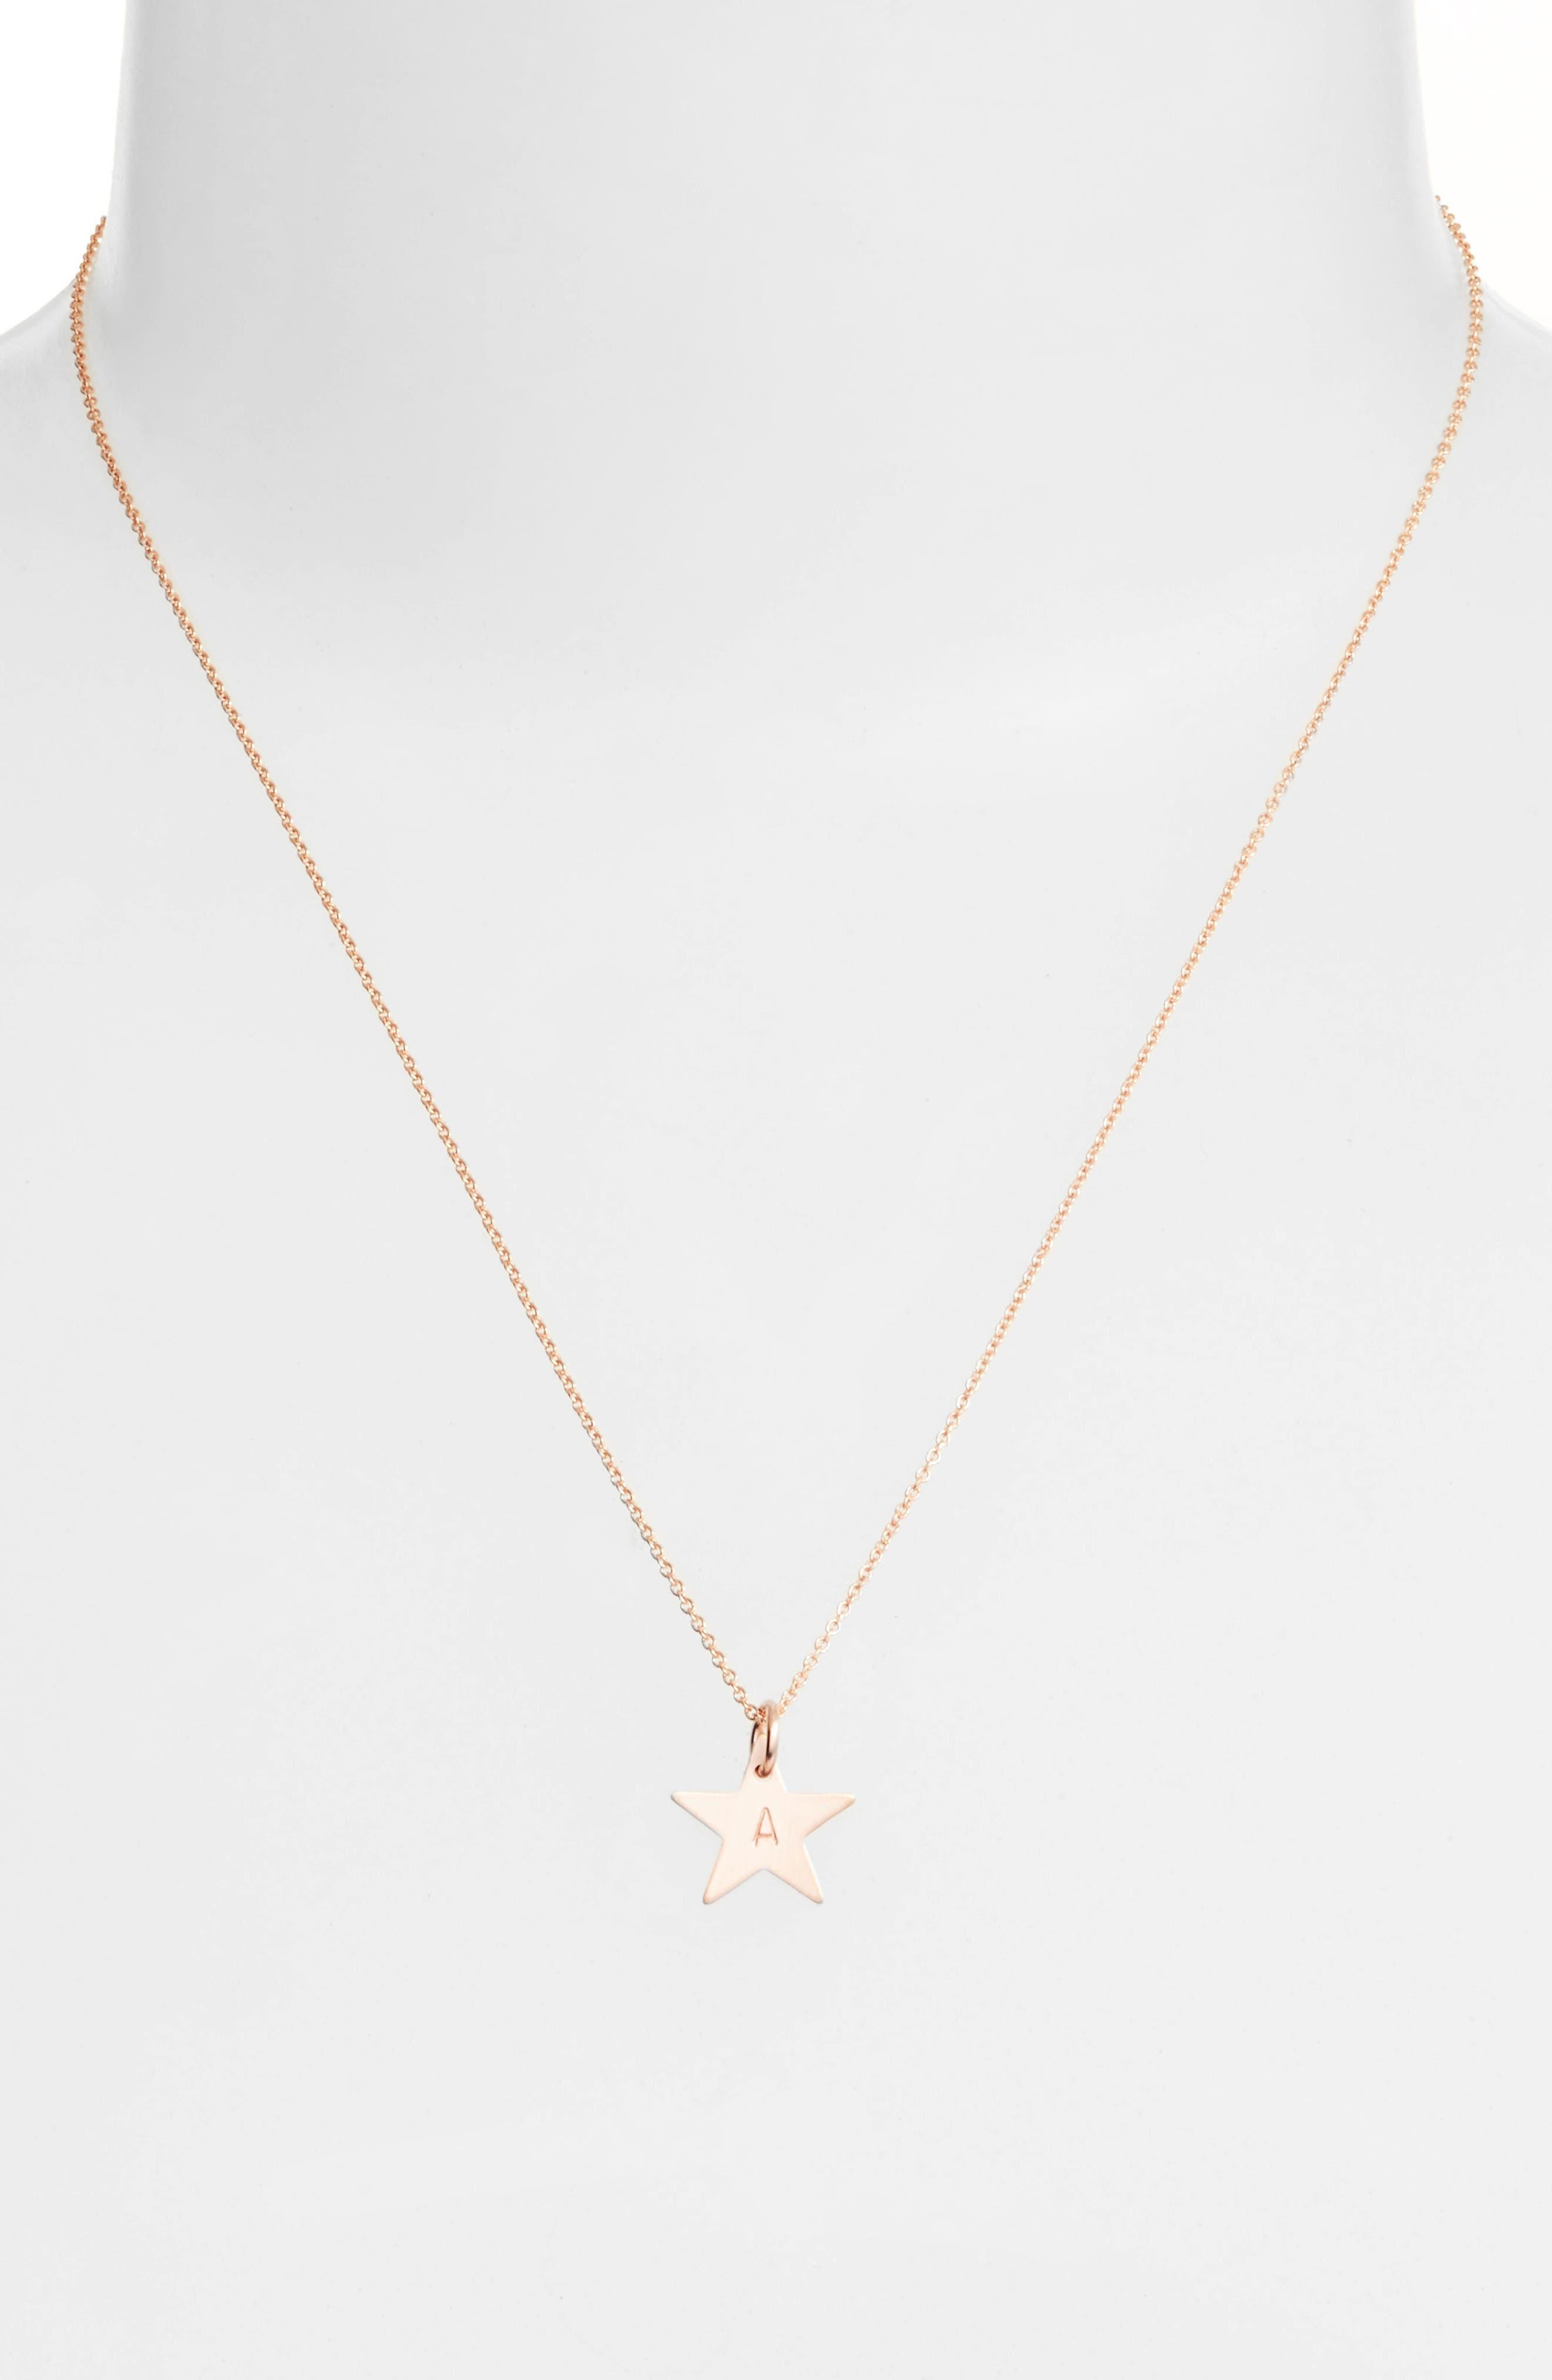 14k-Rose Gold Fill Initial Mini Star Pendant Necklace,                             Alternate thumbnail 2, color,                             710